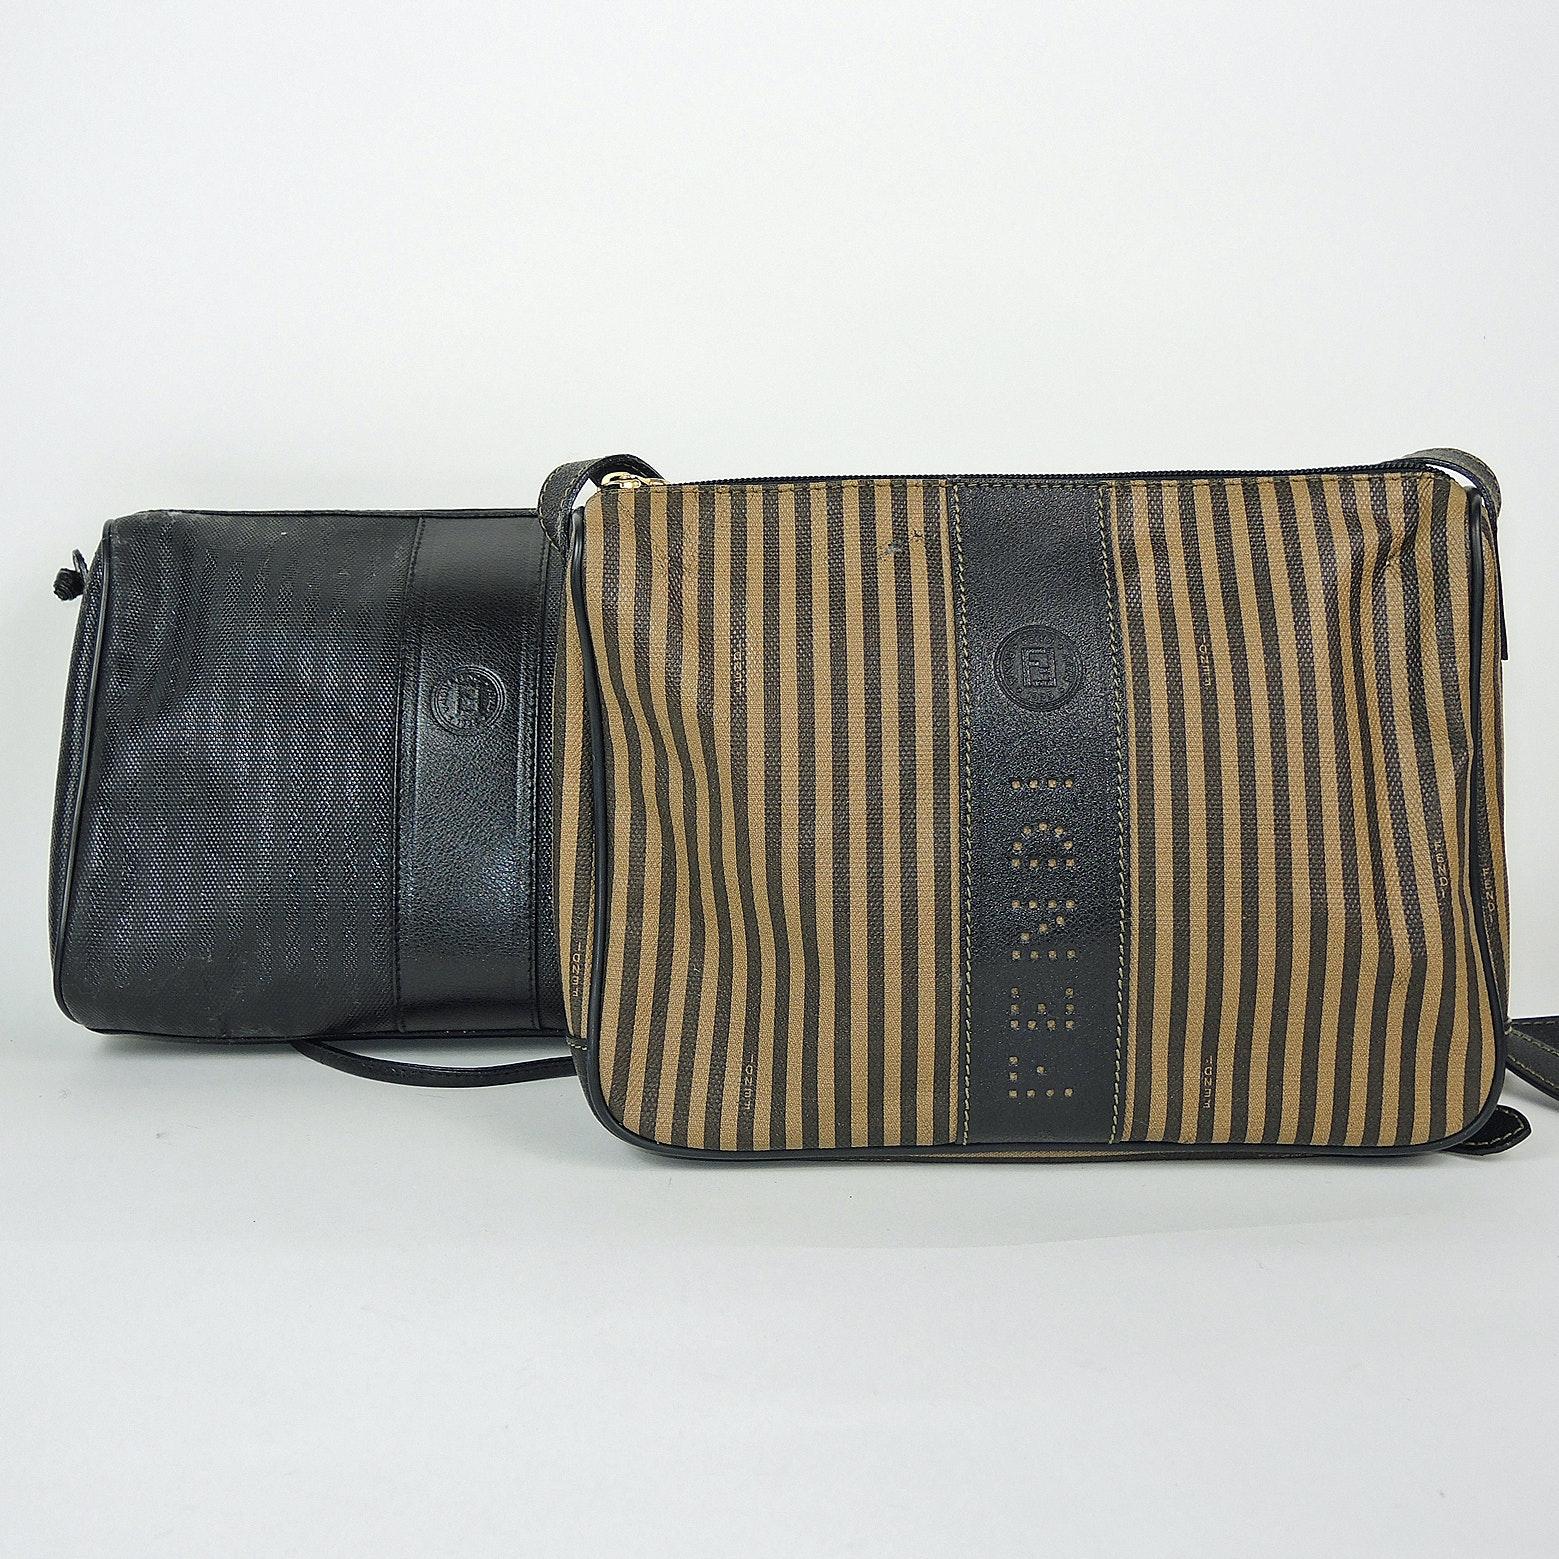 Fendi Striped Coated Canvas And Black Coated Canvas Purses